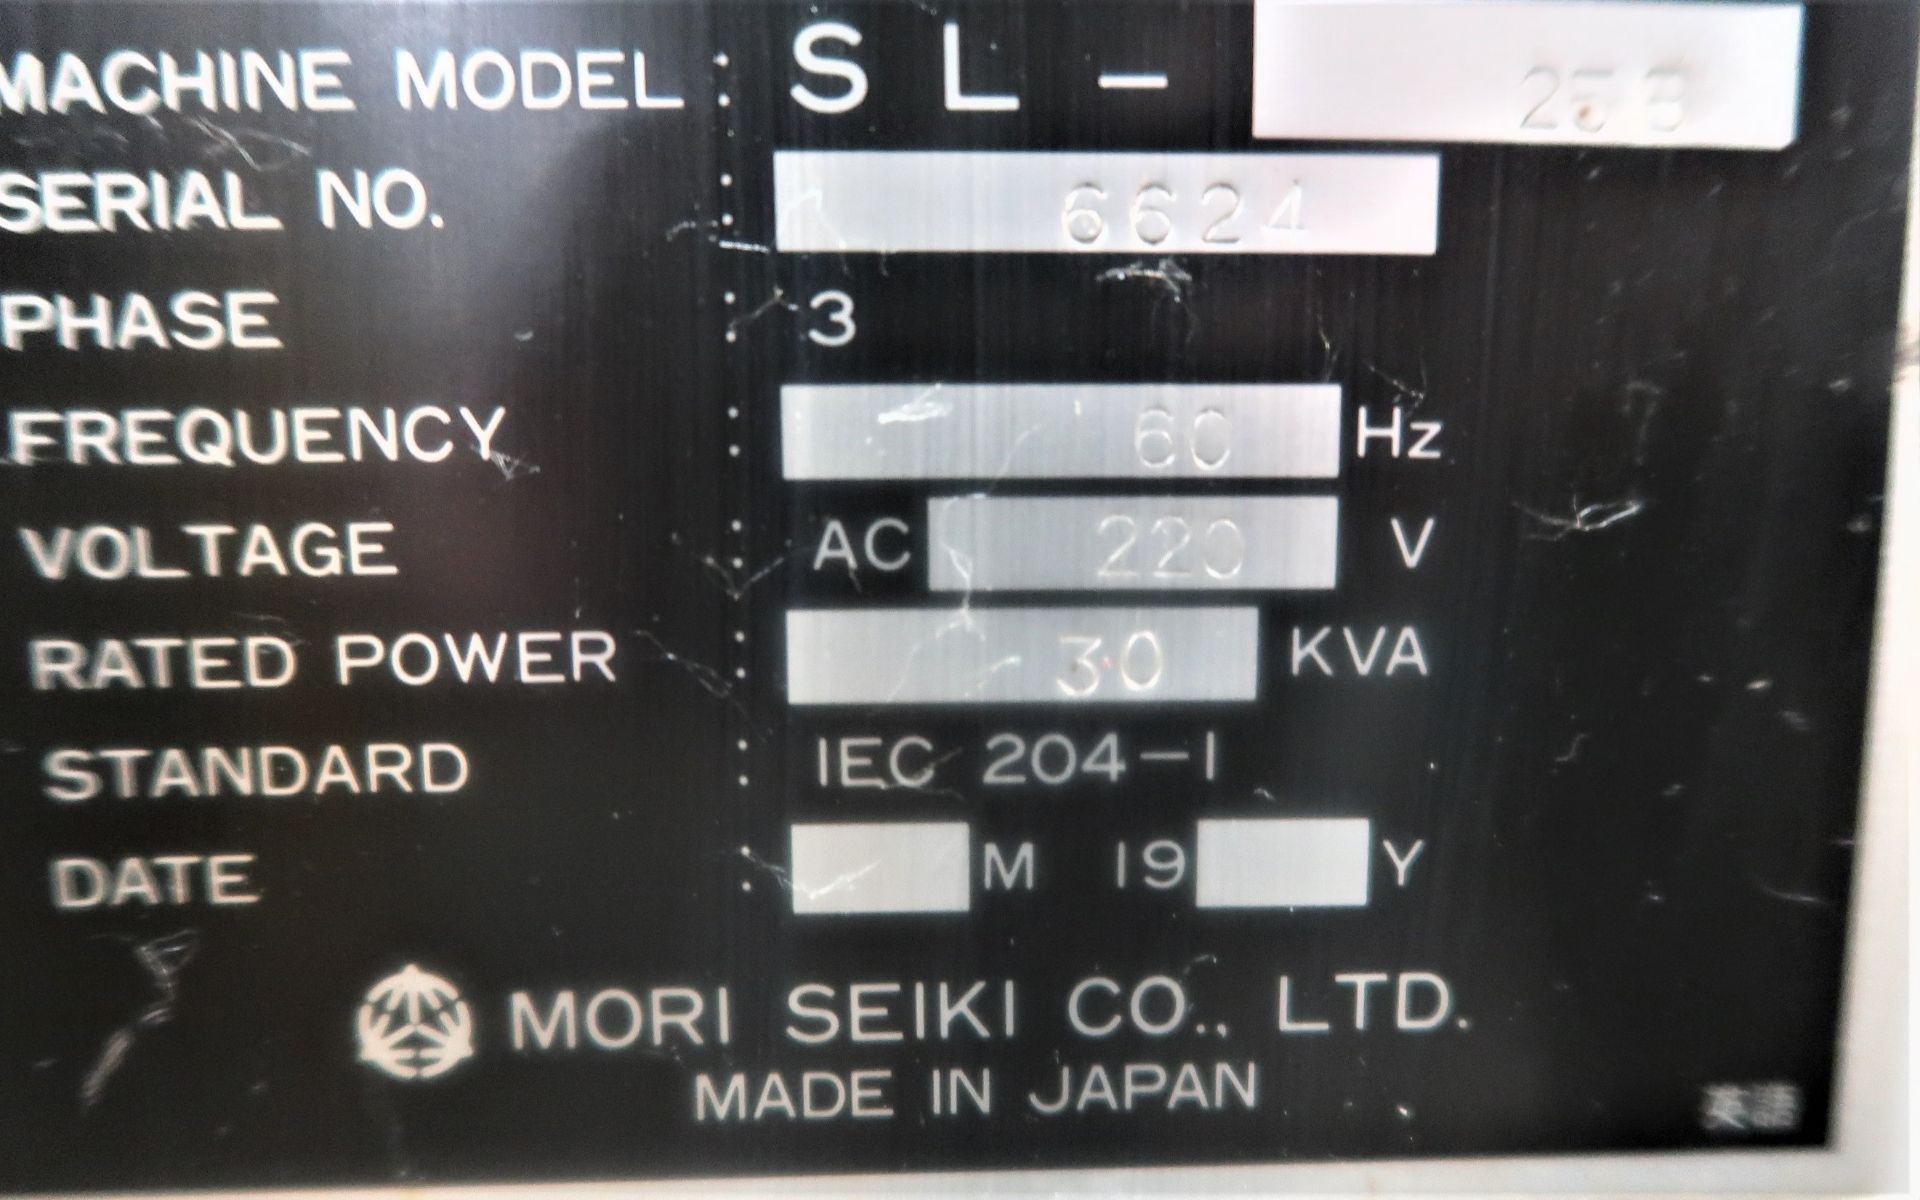 Lot 10C - MORI SEIKI SL-25 CNC 2-AXIS TURNING CENTER LATHE WITH LNS QUICK LOAD BAR FEED